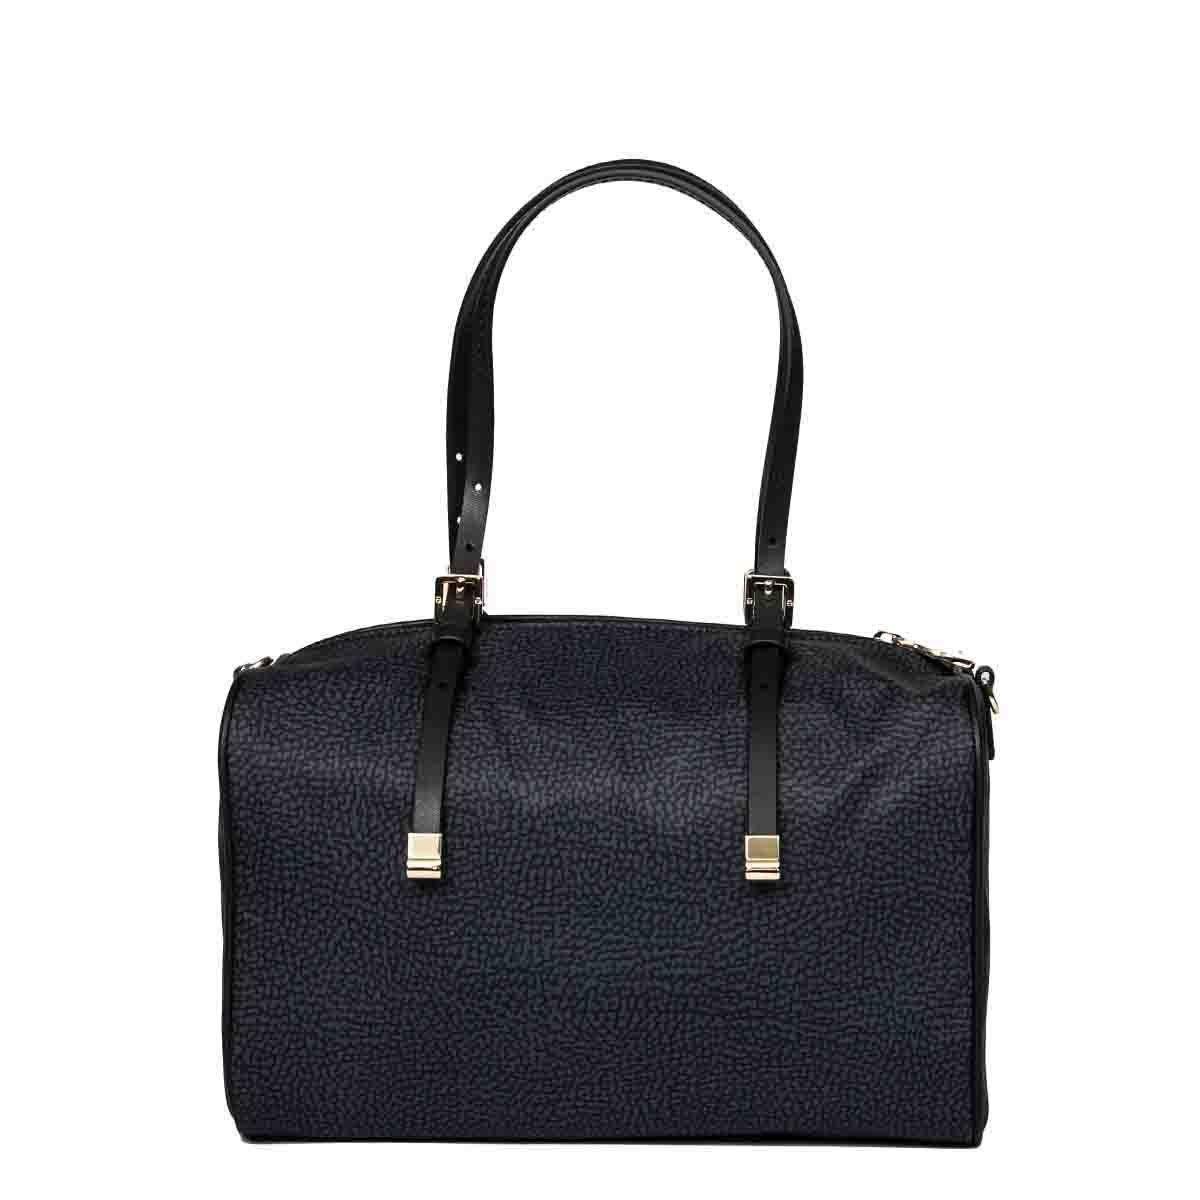 Borbonese Handbags BORBONESE WOMEN'S BLACK POLYESTER HANDBAG